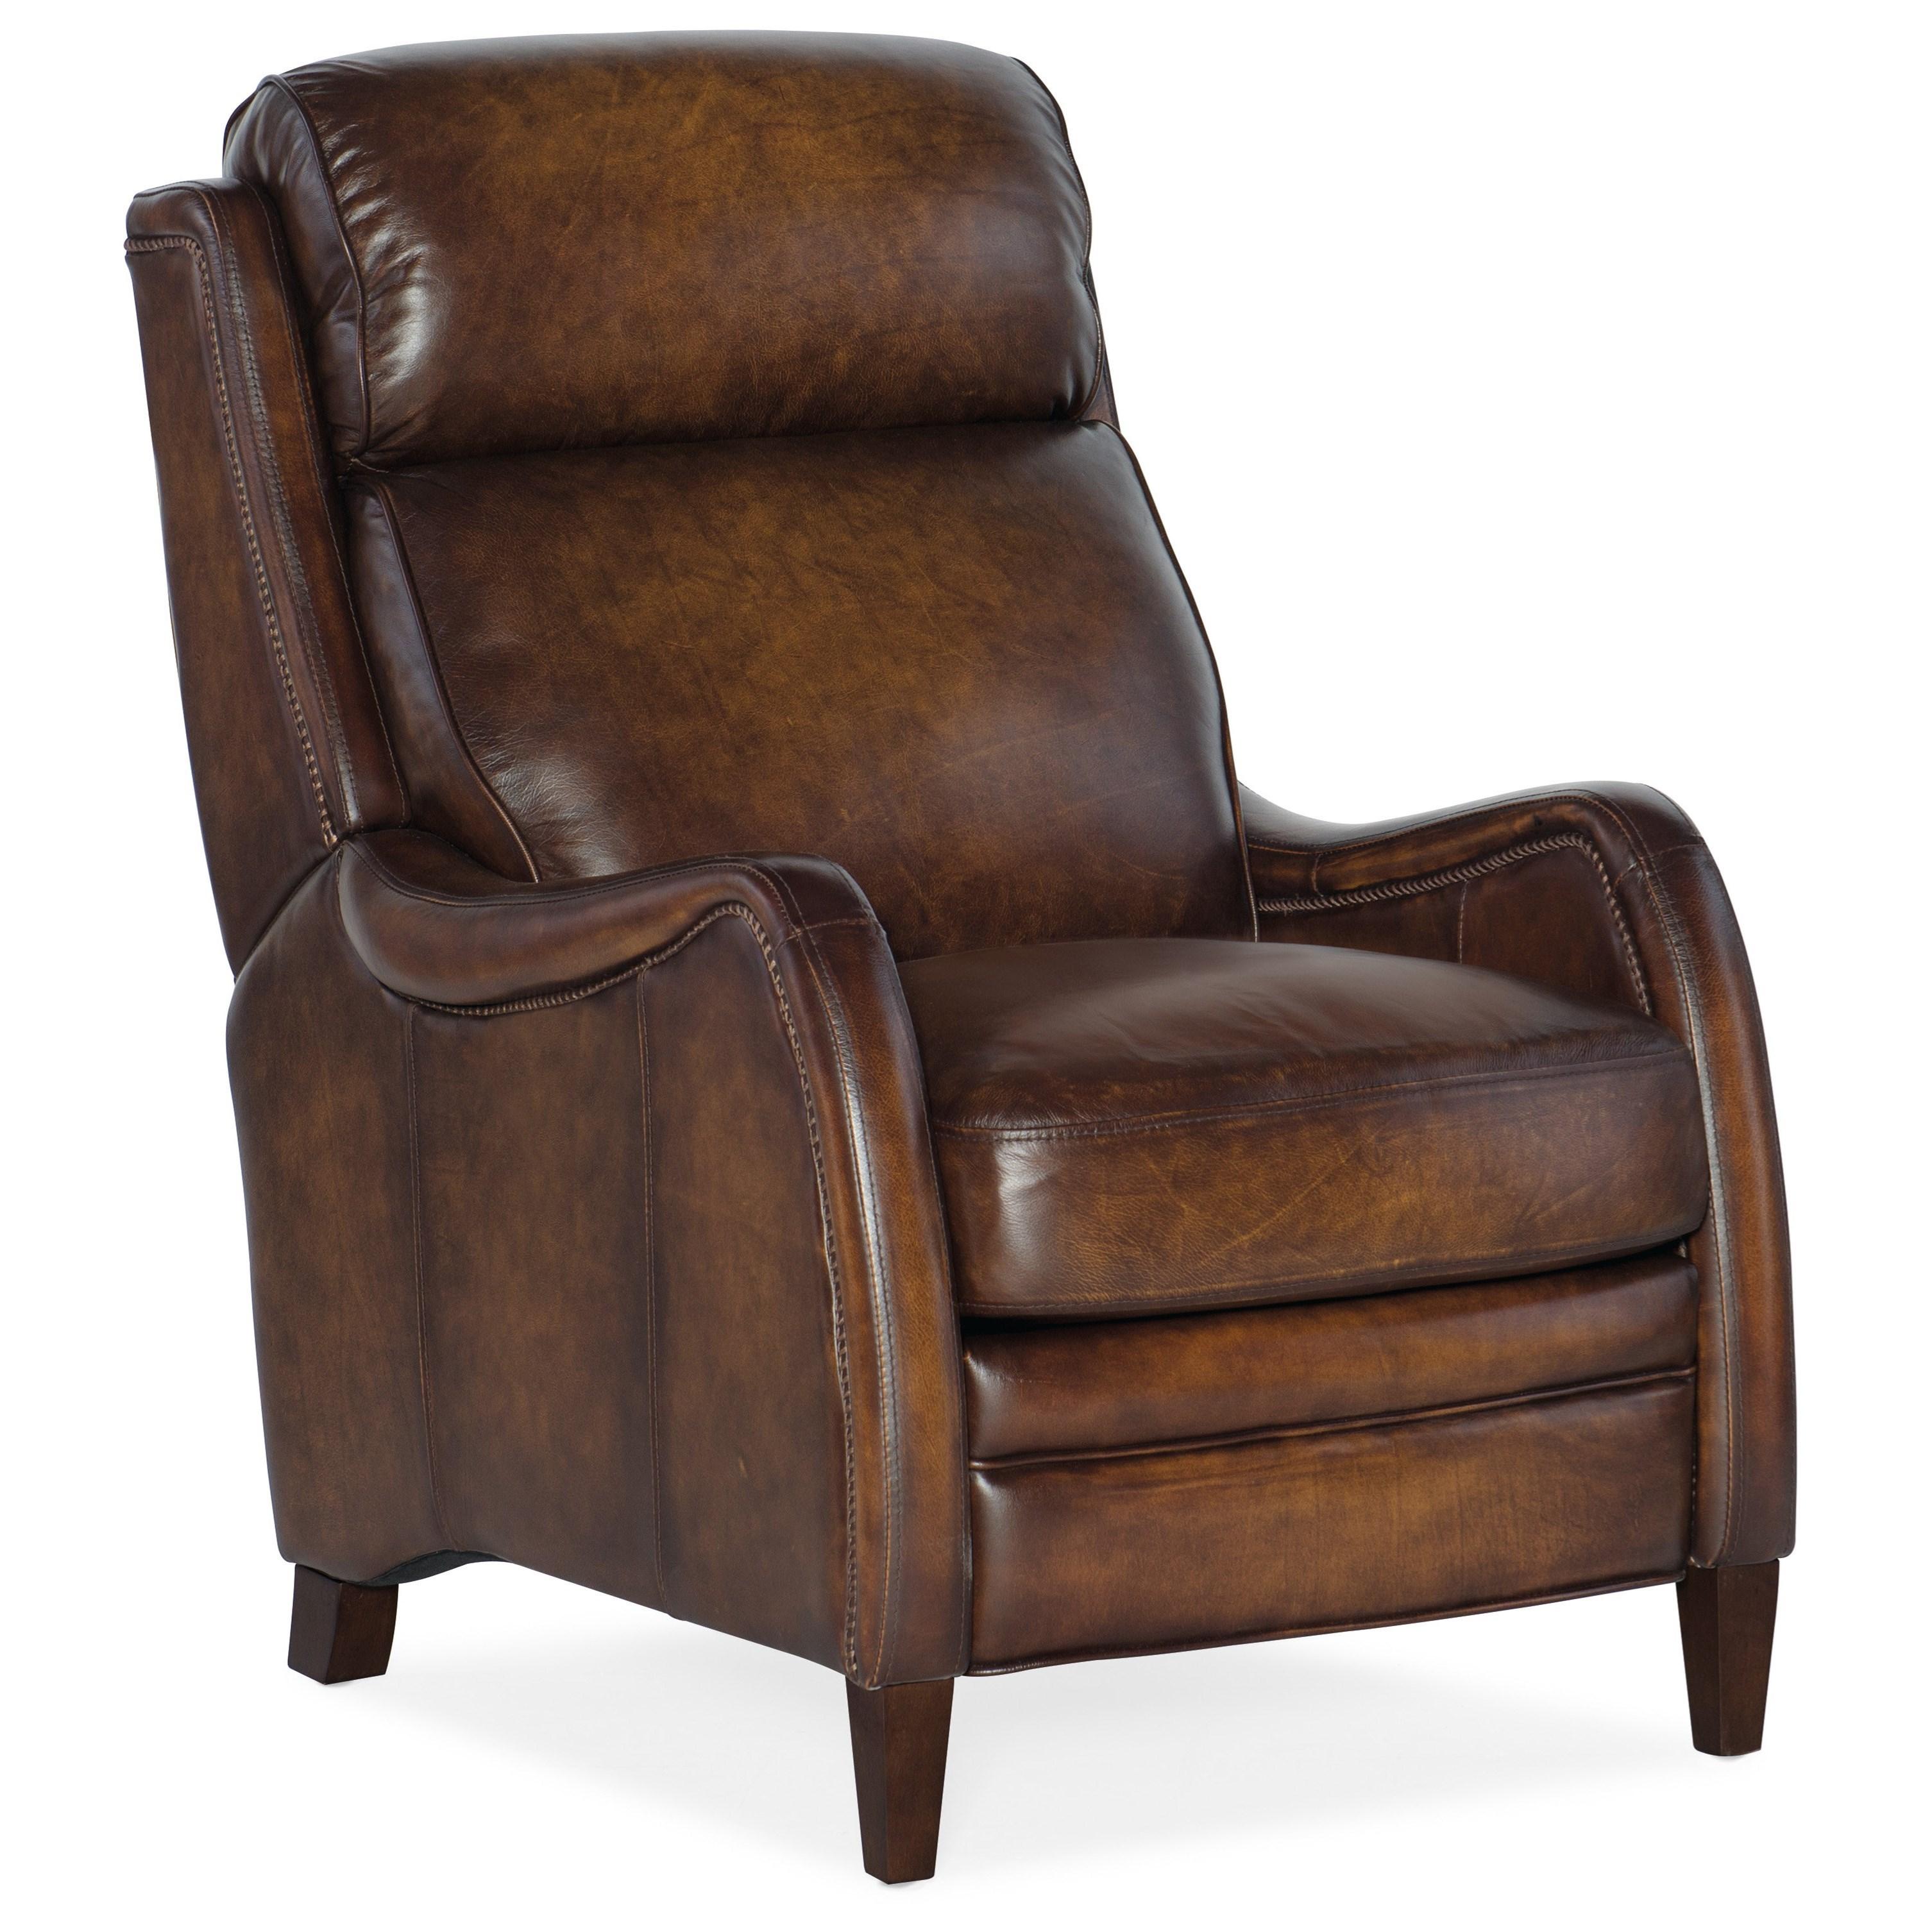 Stark Manual Push Back Recliner by Hooker Furniture at Johnny Janosik